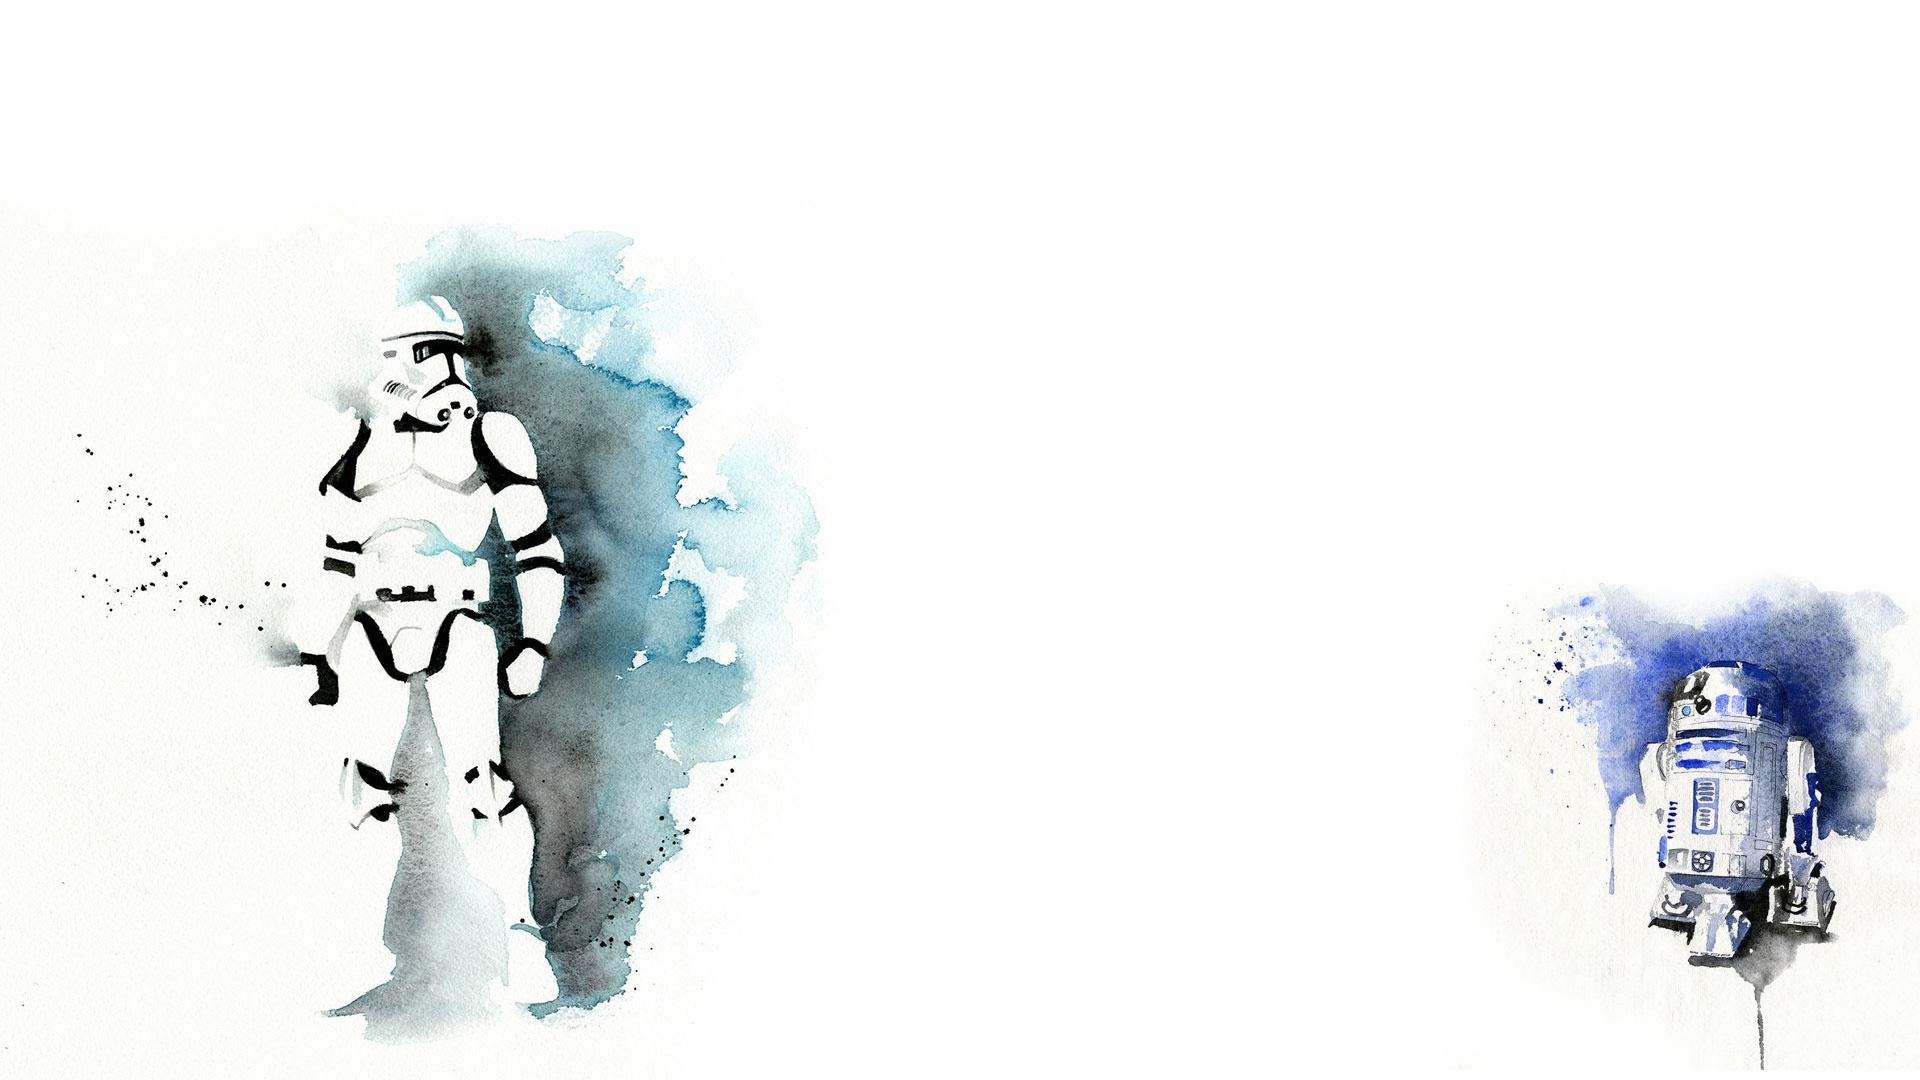 Plano De Fundo Full Hd: Star Wars Papel De Parede HD